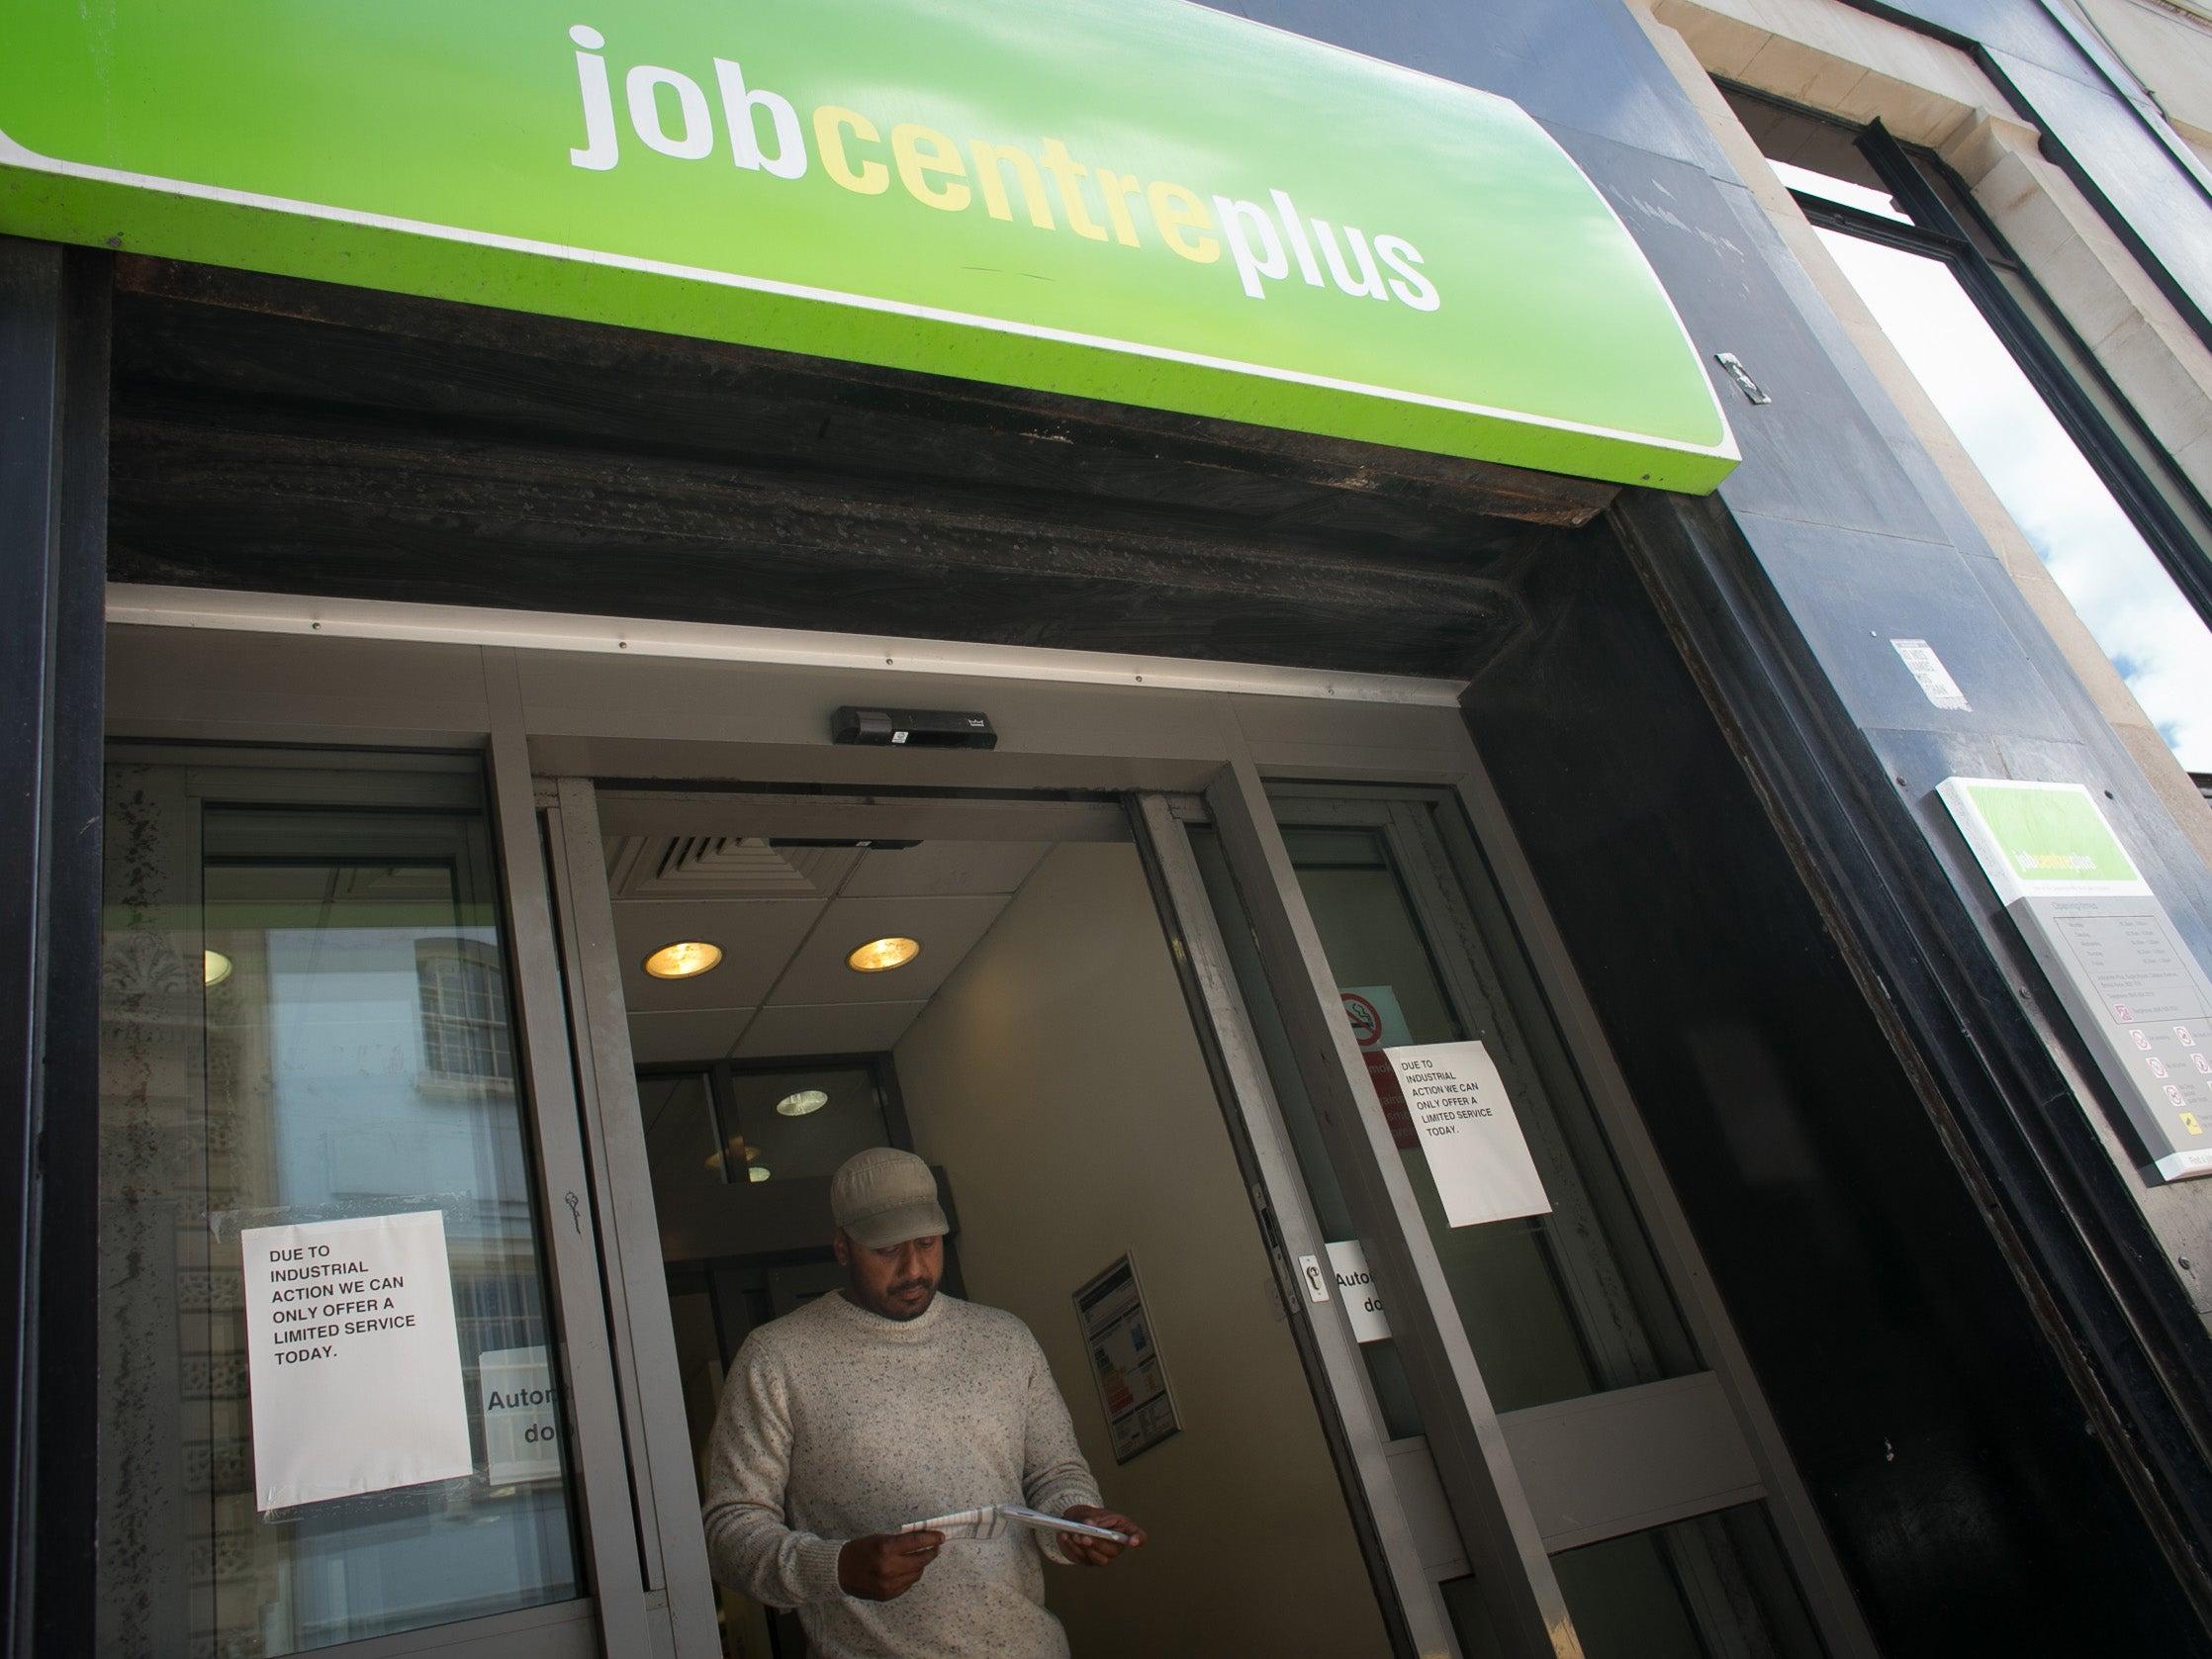 Coronavirus: UK jobs market facing worst outlook in almost 30 years, poll finds